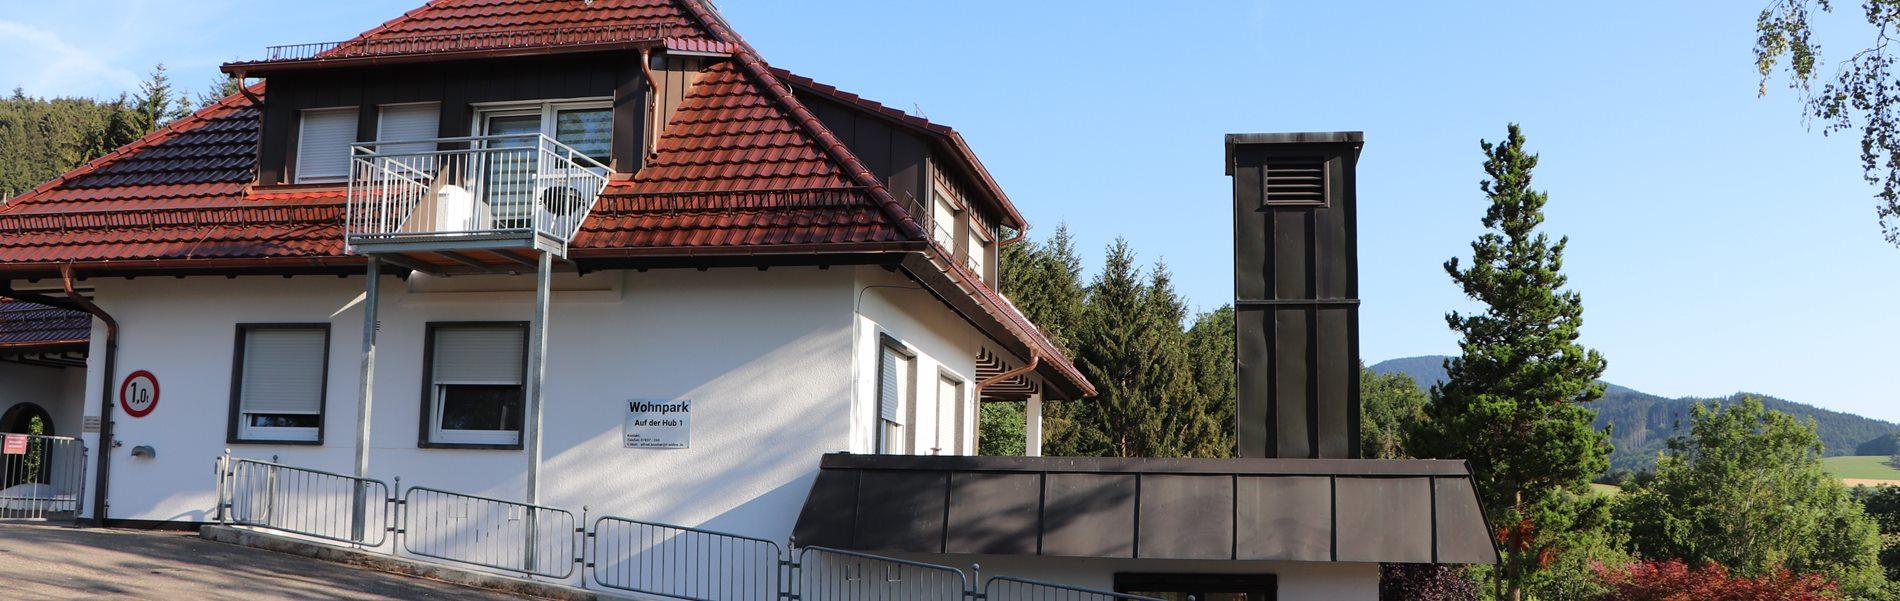 mietwohnung-in-oberharmersbach-schwarzwald